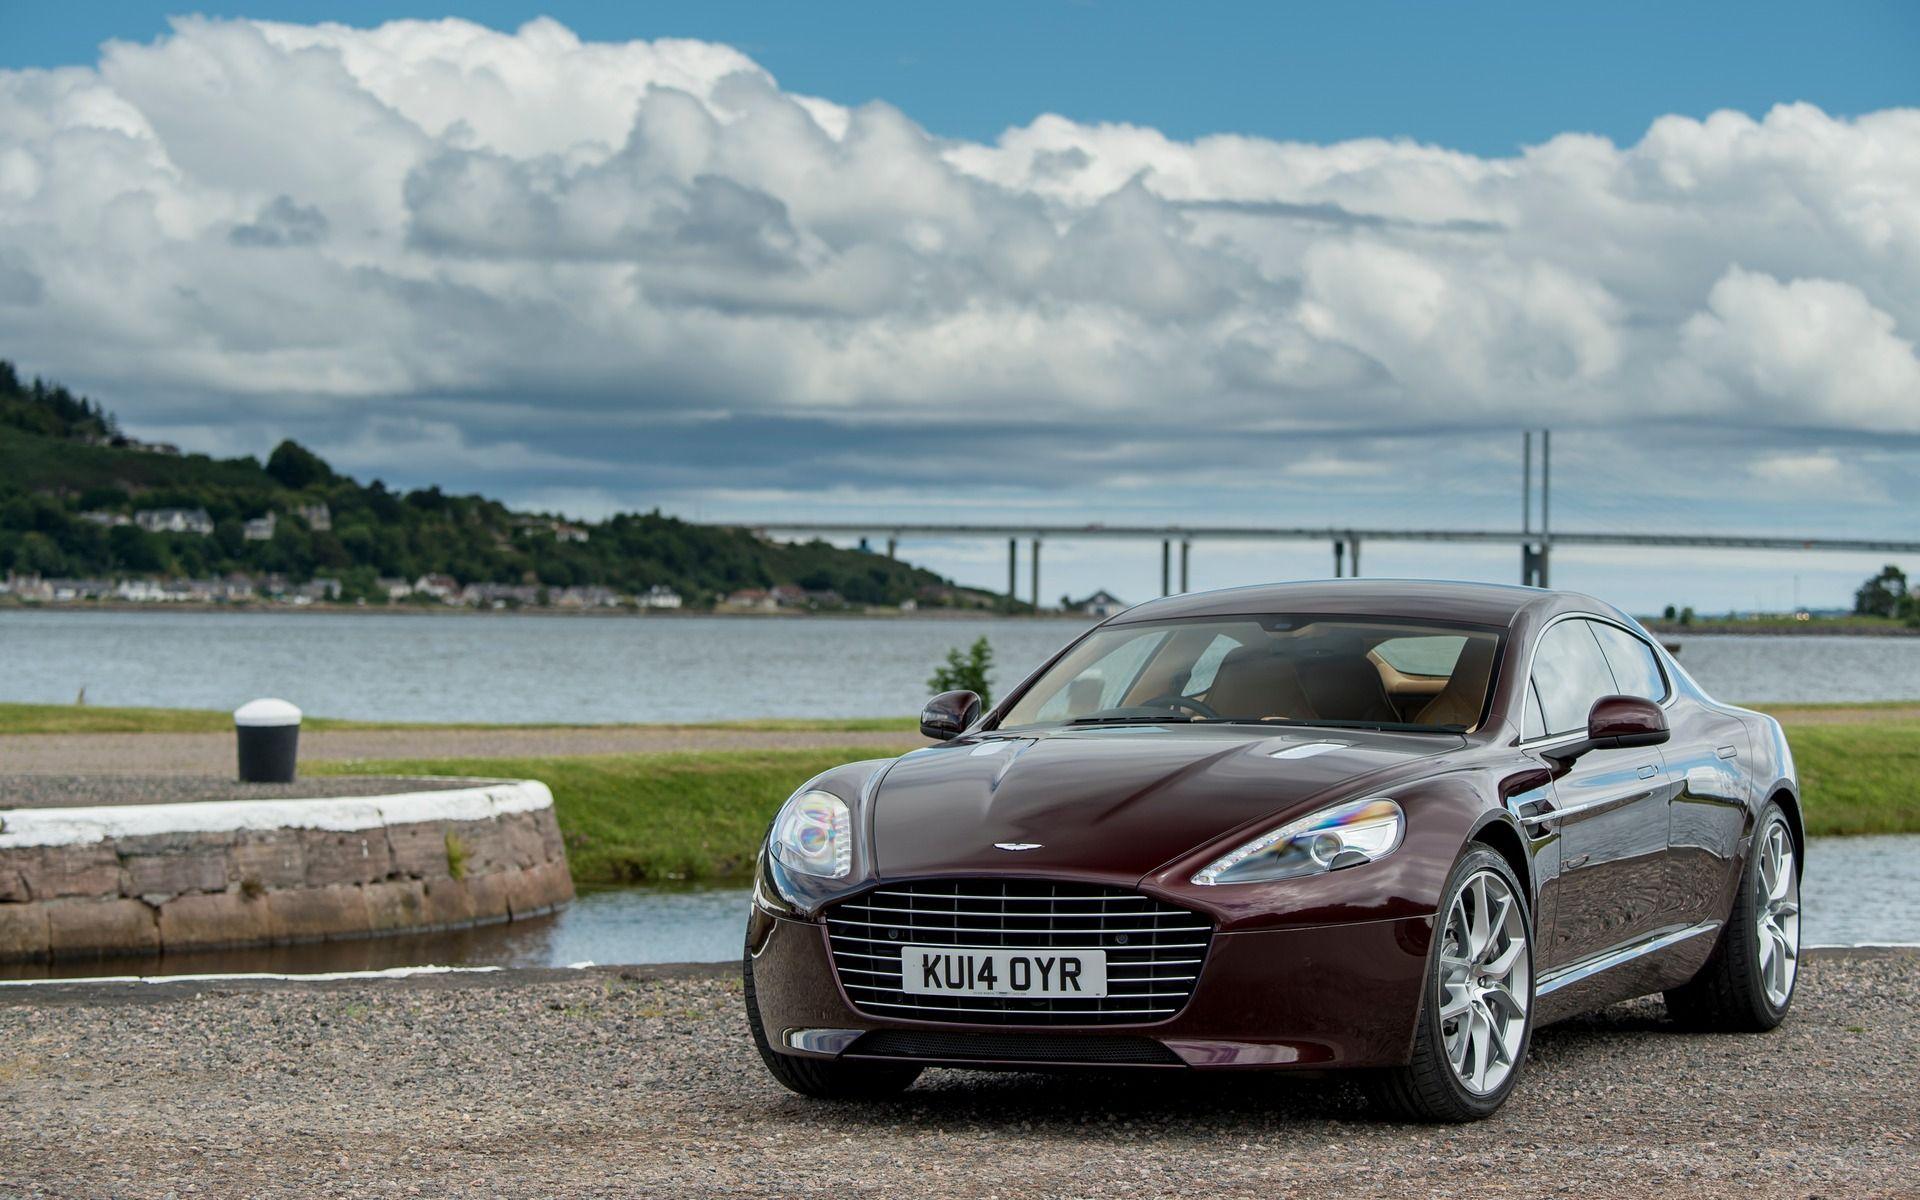 2017 Aston Martin Rapide S Specs Review Price 2016 2017 Best Car Reviews Aston Martin Rapide Aston Martin Vanquish Aston Martin Models